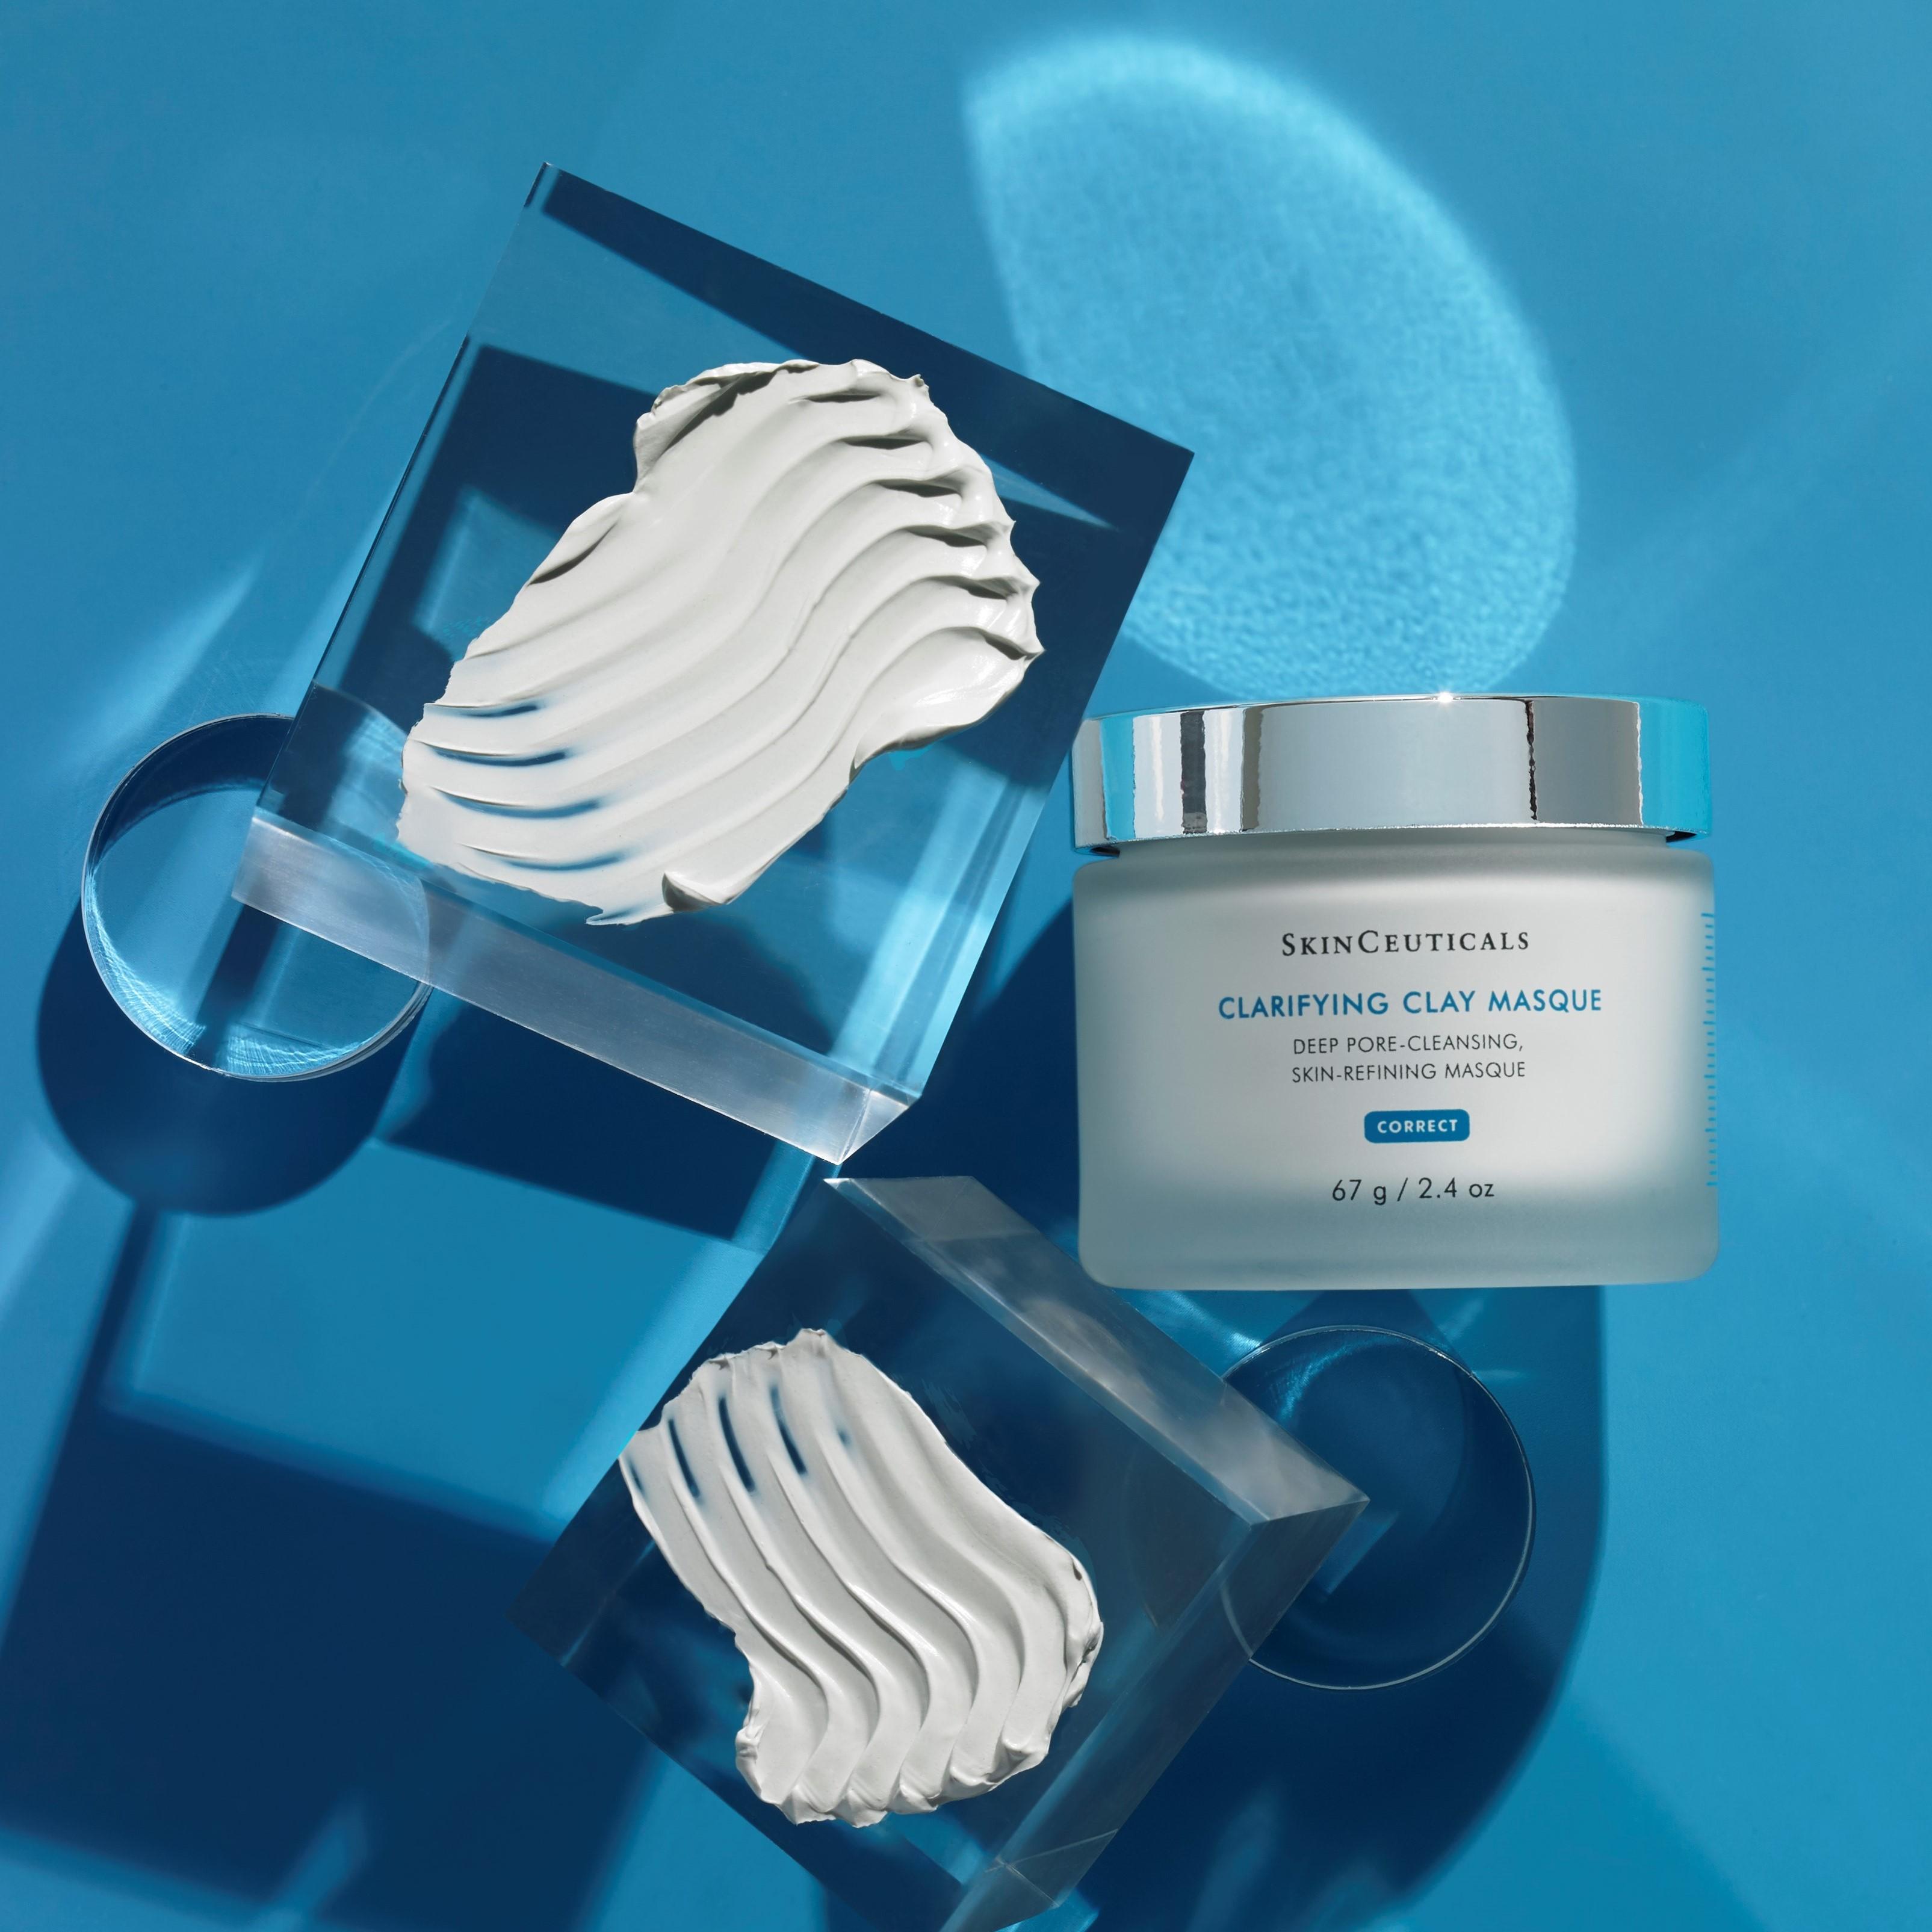 Mascarillas para piel grasa con Clarifying Clay Masque